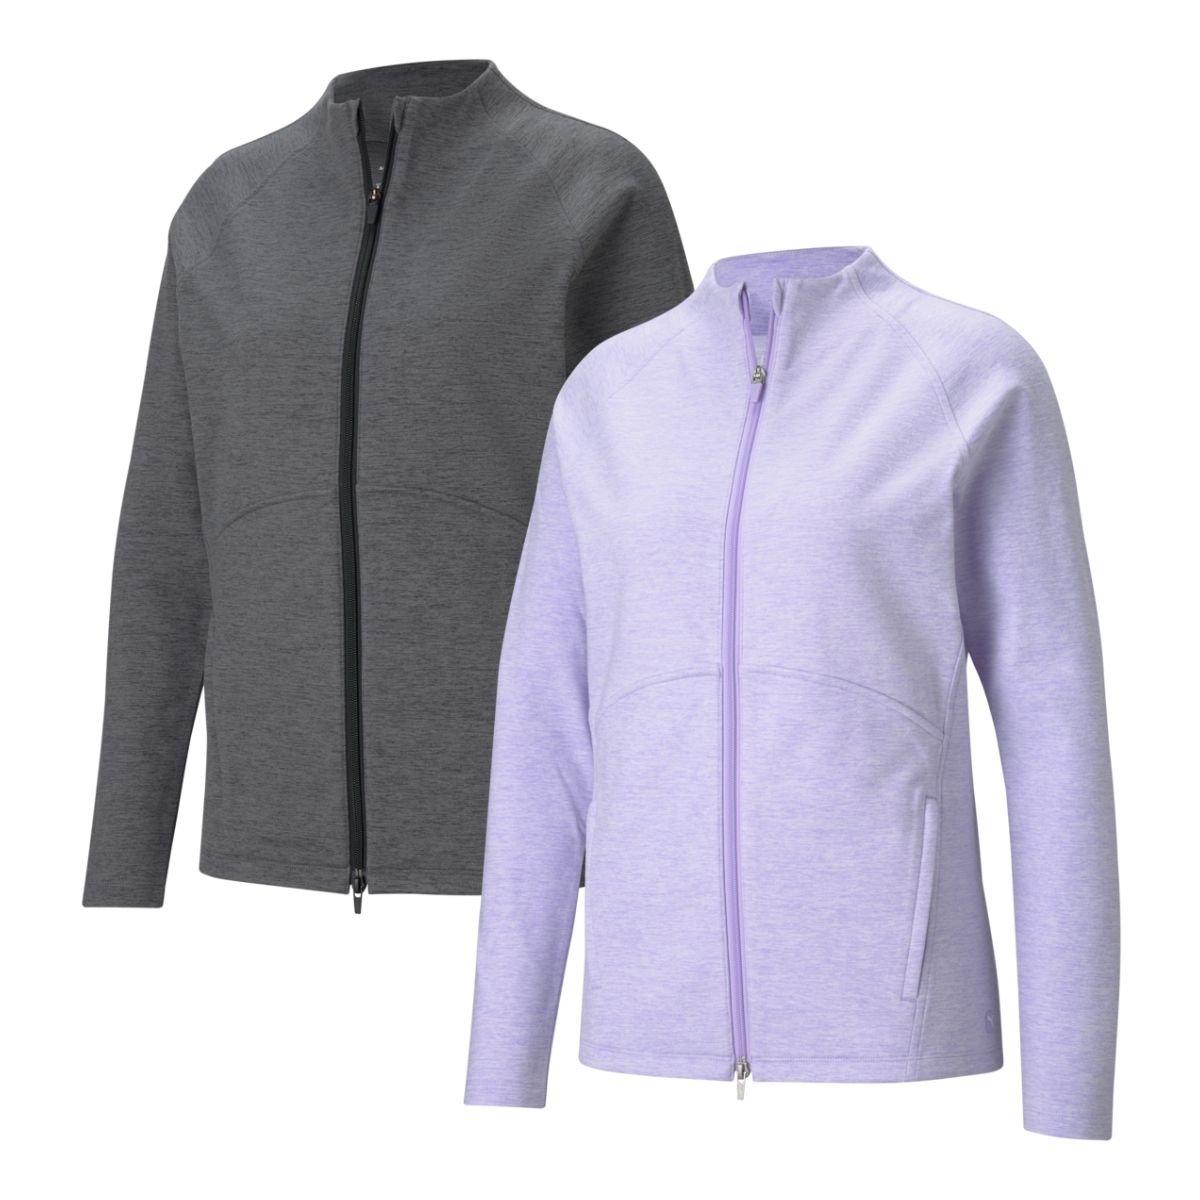 Puma Women's 2021 Cloudspun Full Zip Jacket